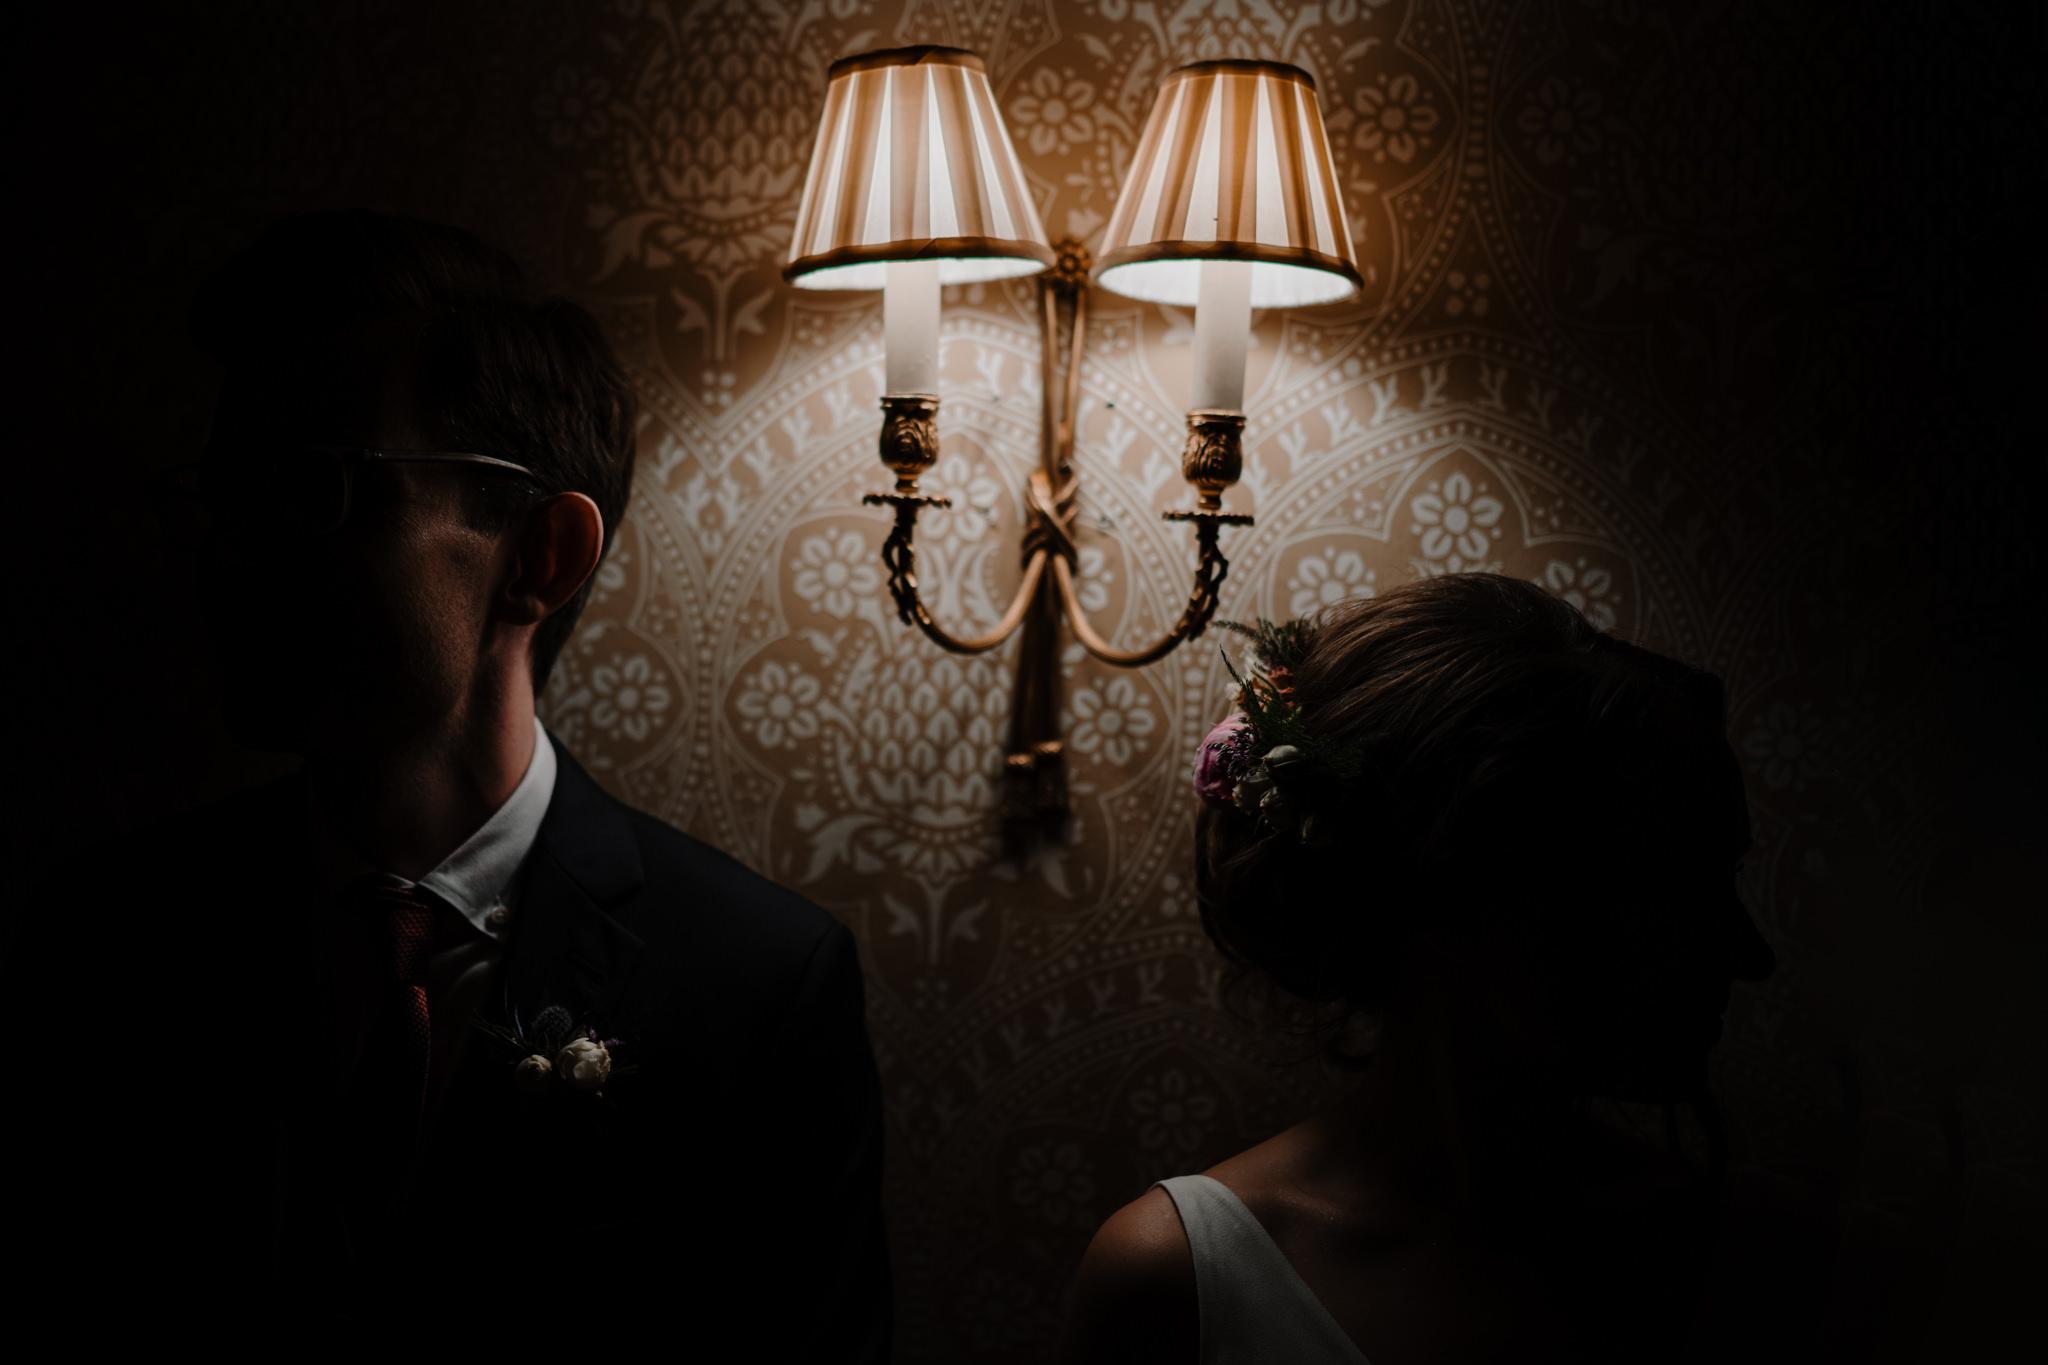 Intimate Wes Anderson style wedding crom castle bride groom lamplight